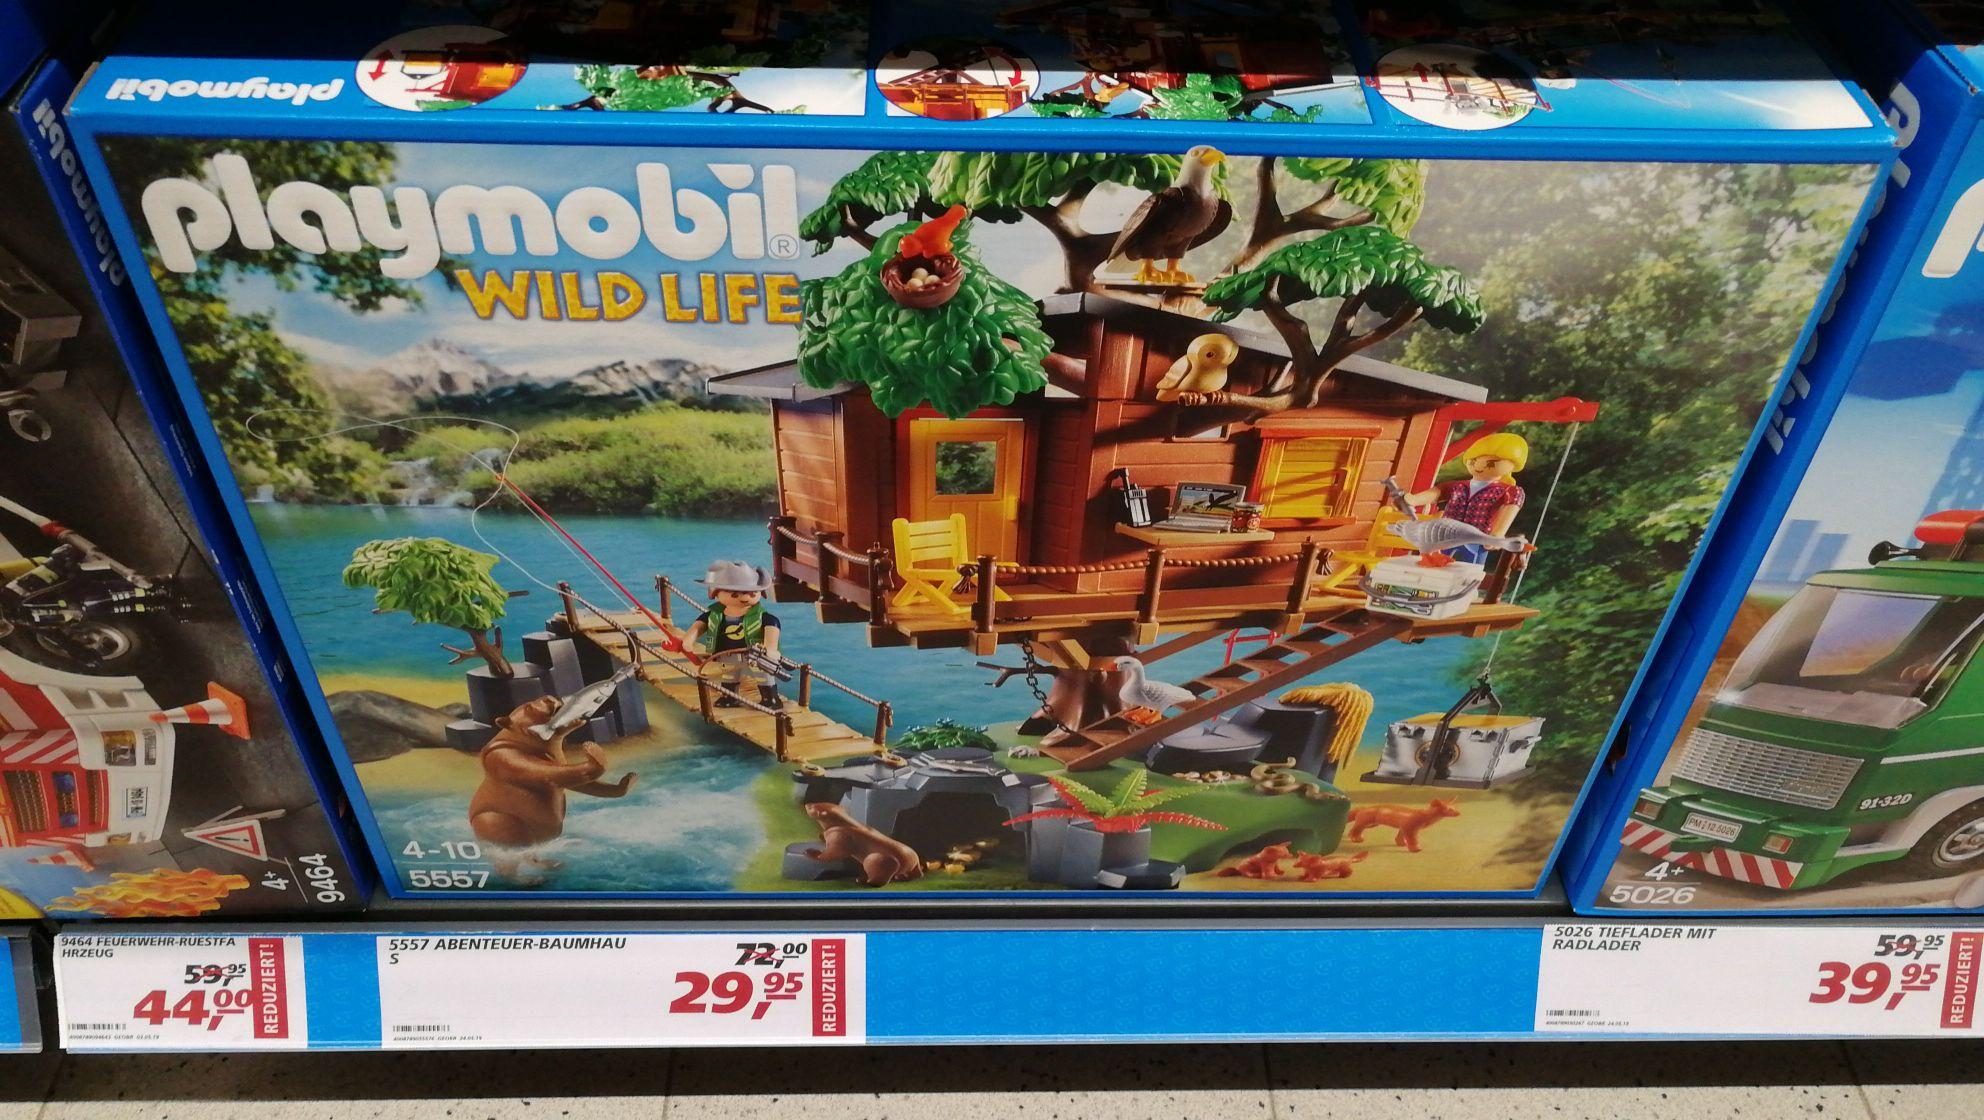 [LOKAL] REAL Sankt Augustin, Frankfurt, Darmstadt u.a.? - Playmobil Abenteuer-Baumhaus 5557